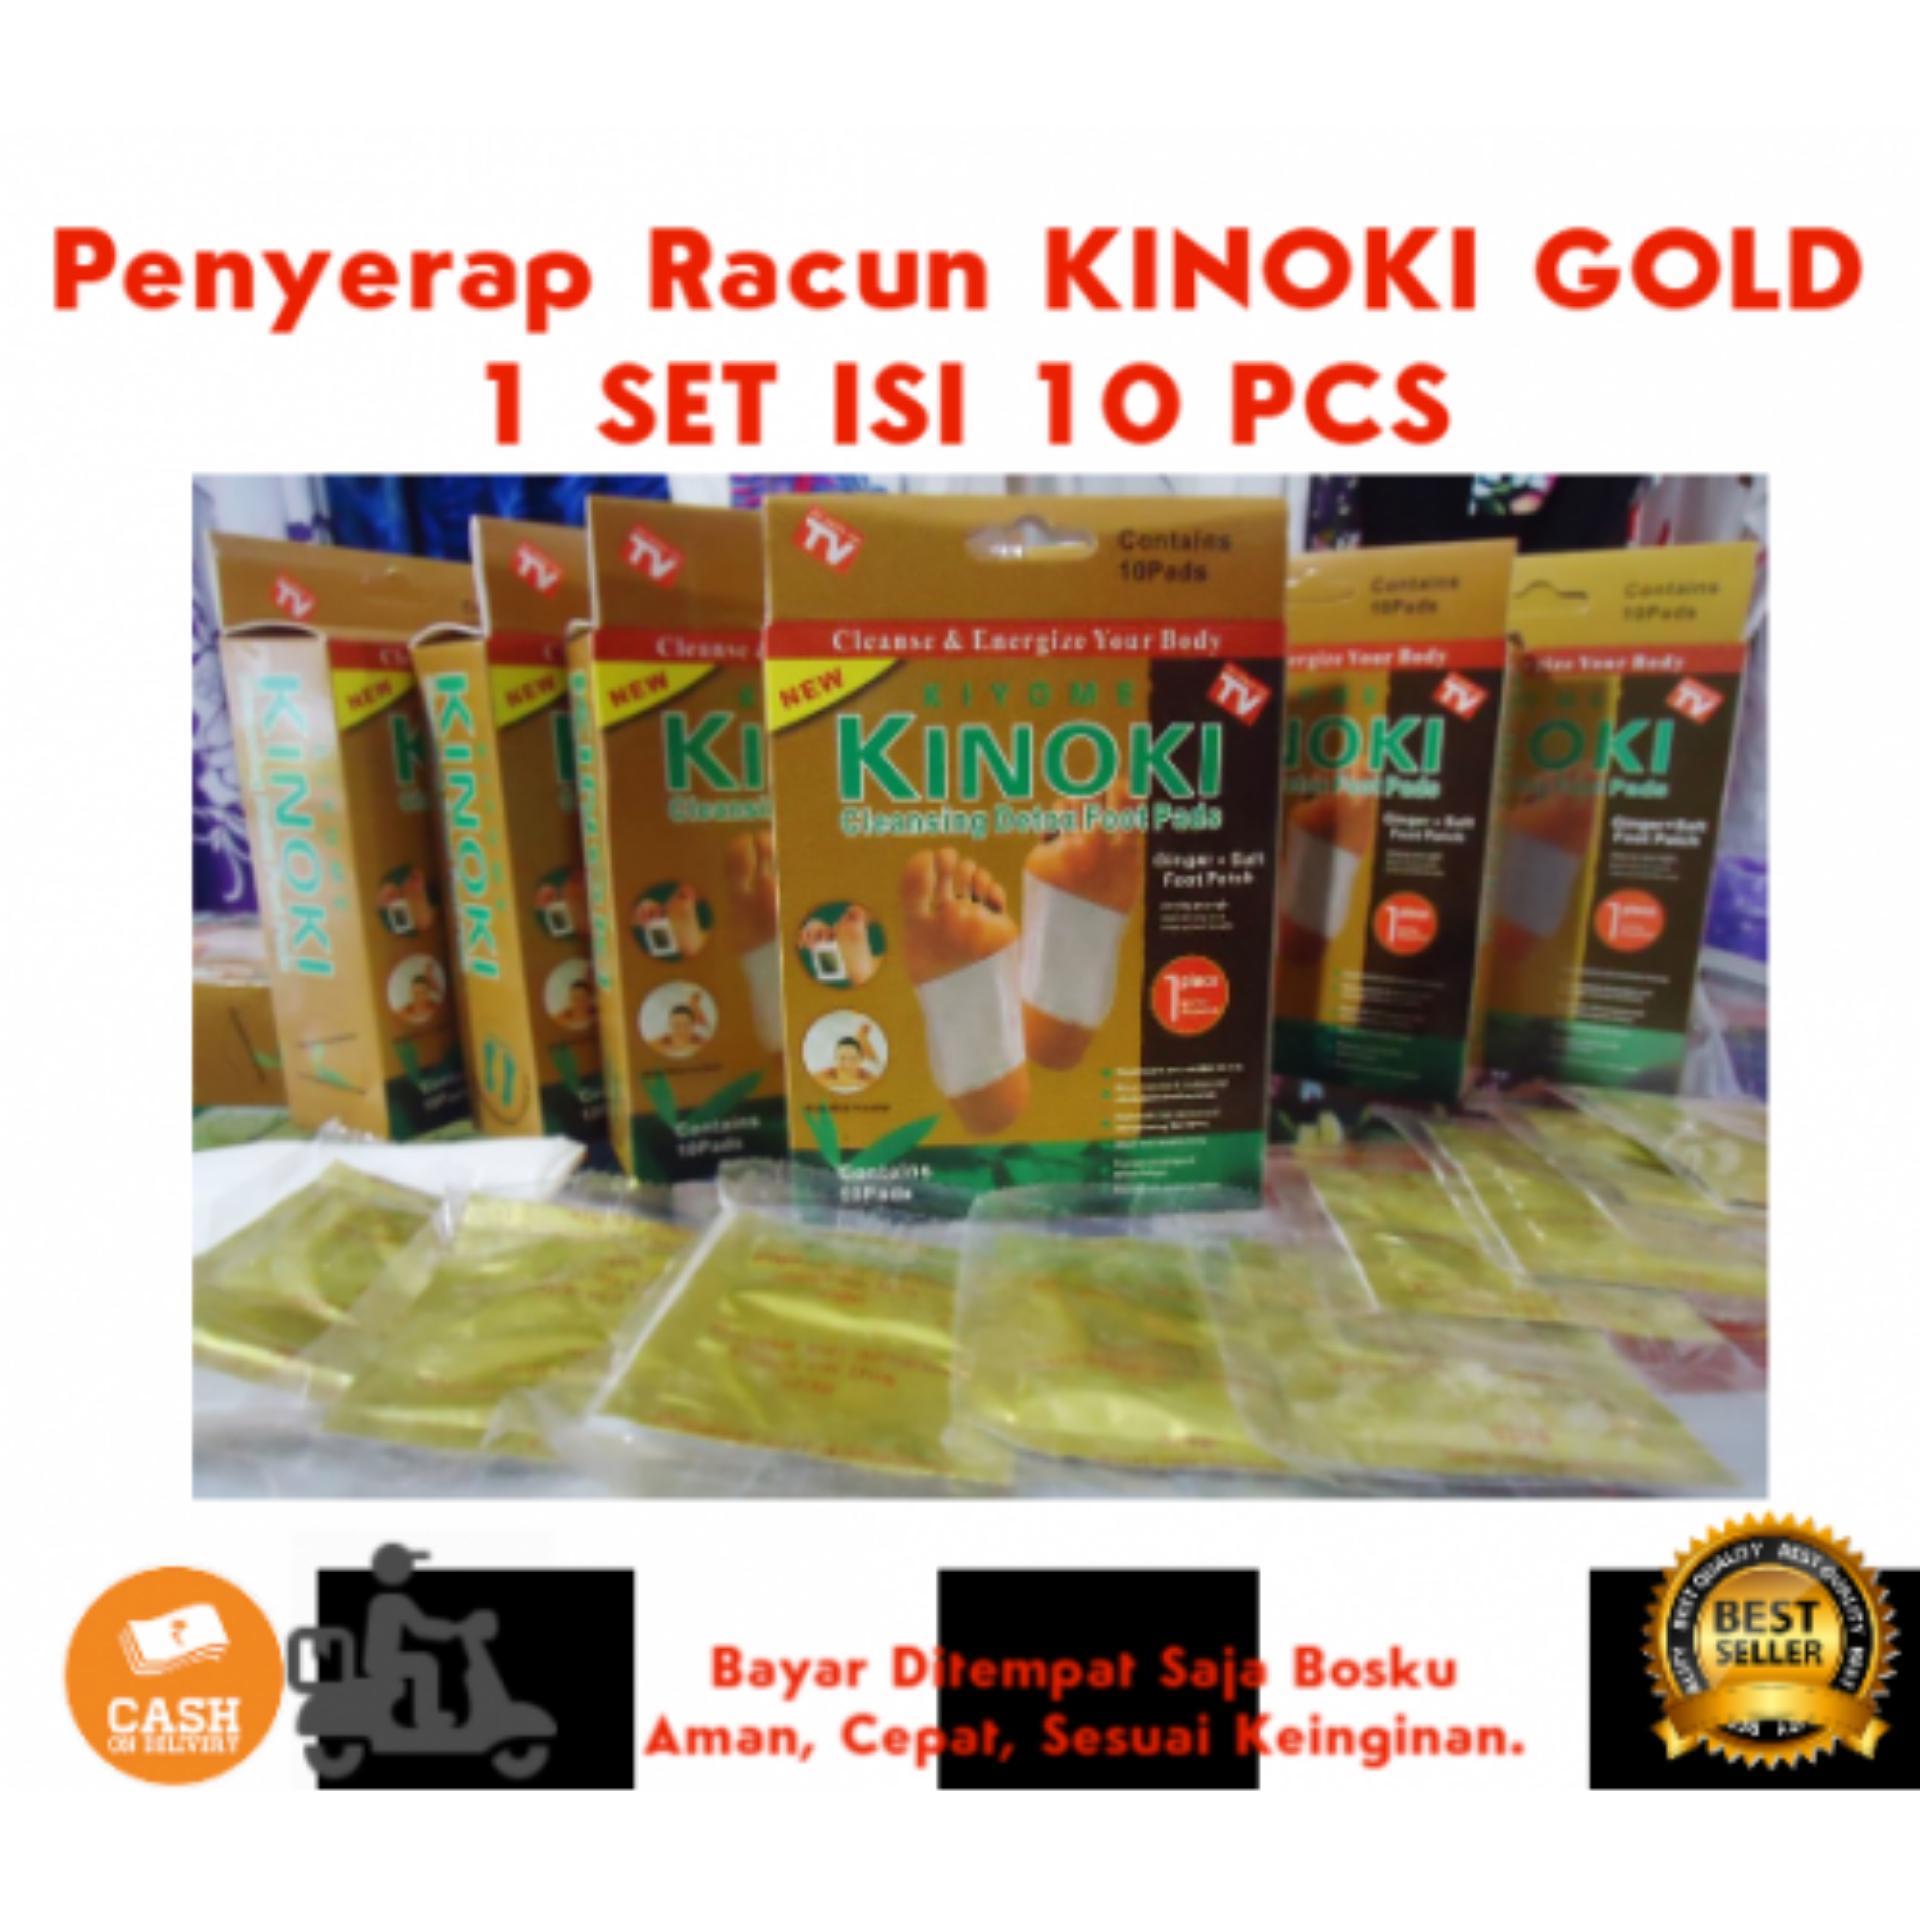 10 Pcs Kinoki Gold Penyerap Kotoran Dan Racun Tubuh Plester Detok Bambo Bamboo Kaki Isi 2bh Hybrid Tech New Sachet